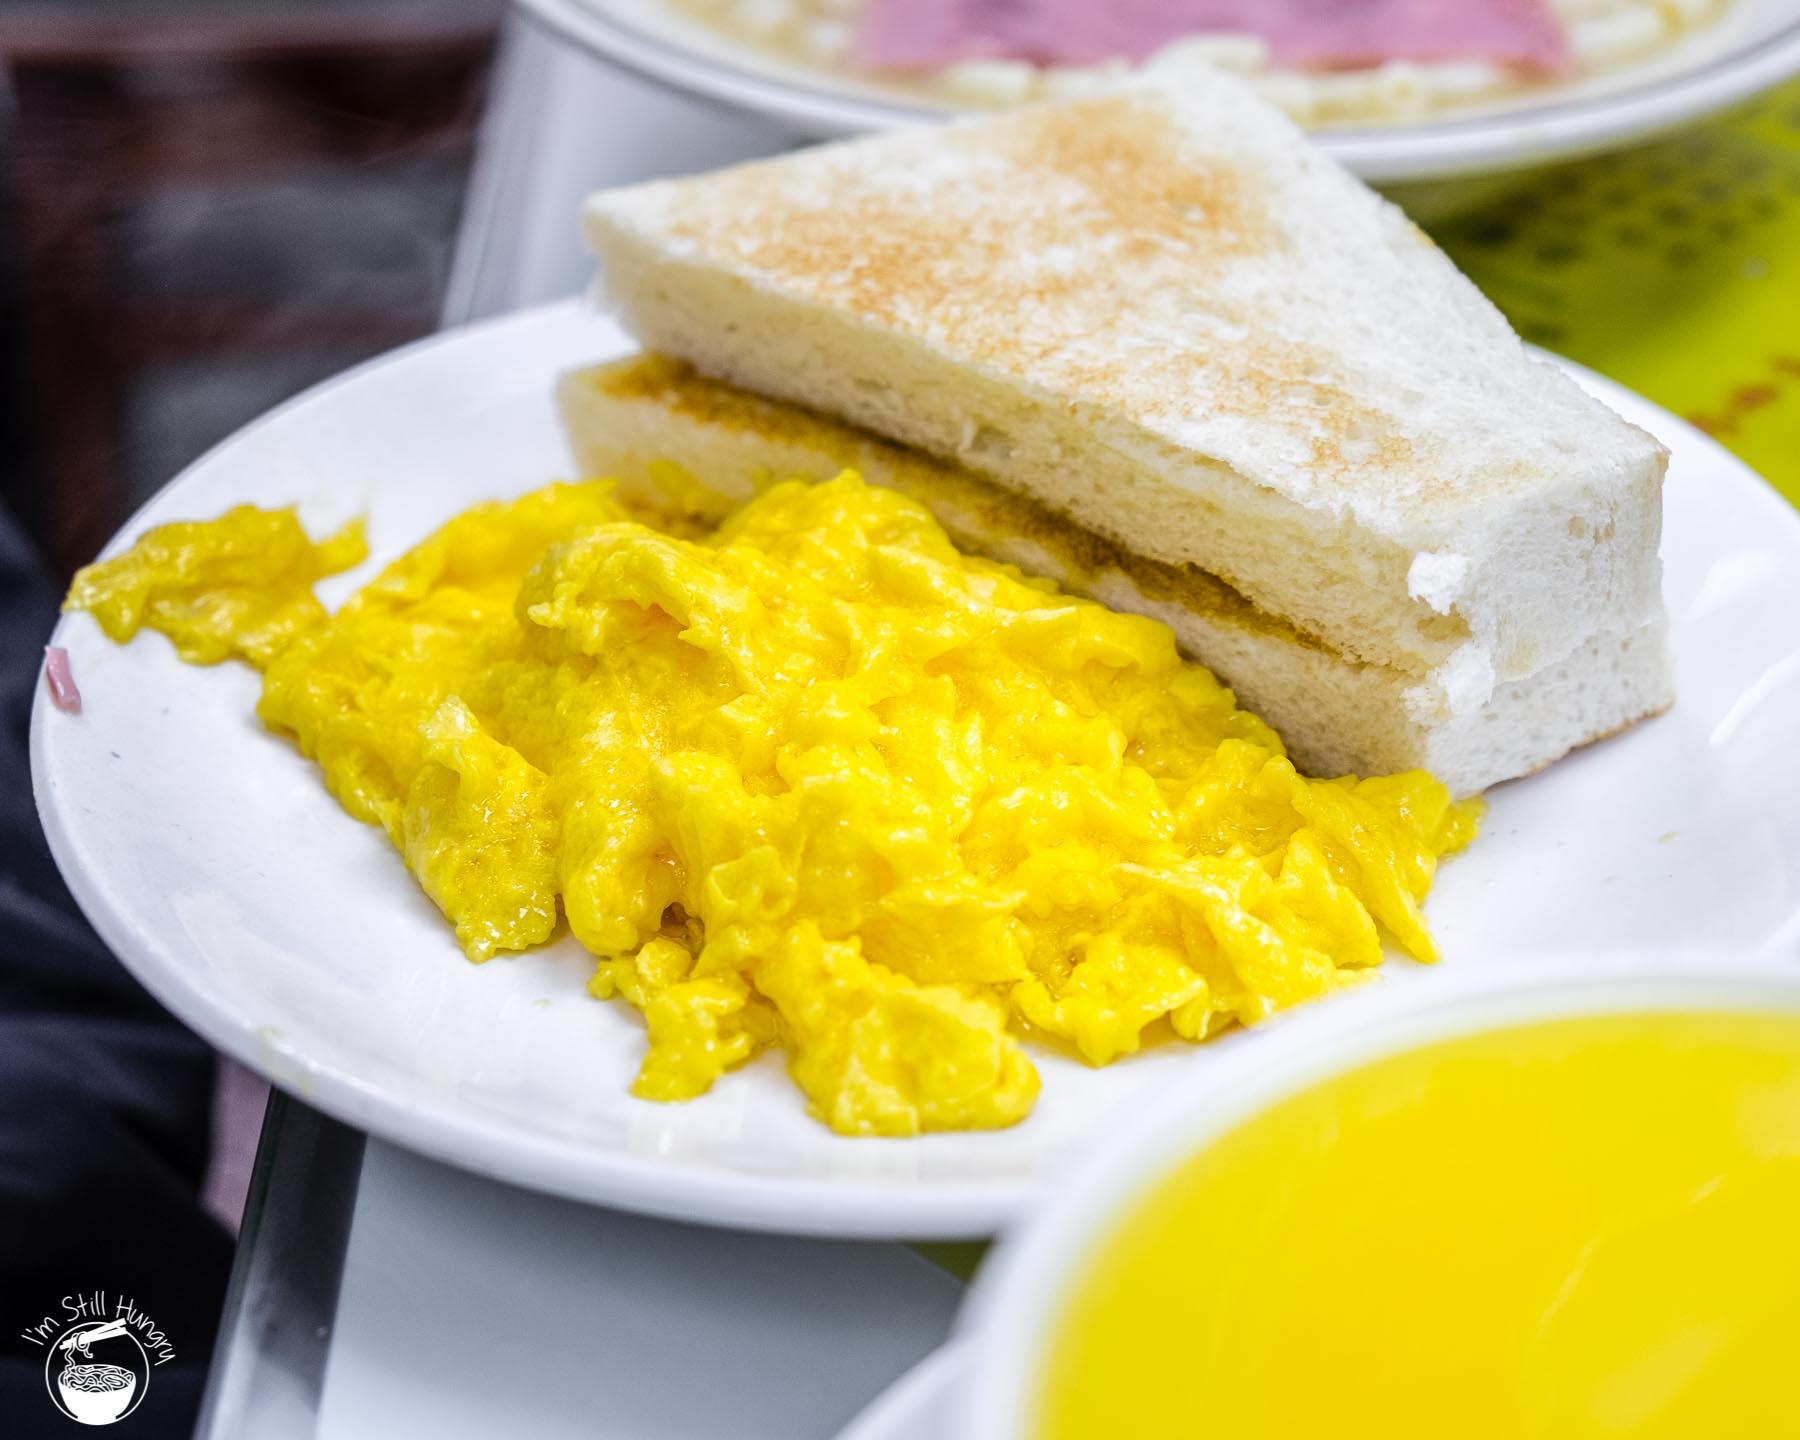 Australia Dairy Company Toast w/scrambled egg on the side